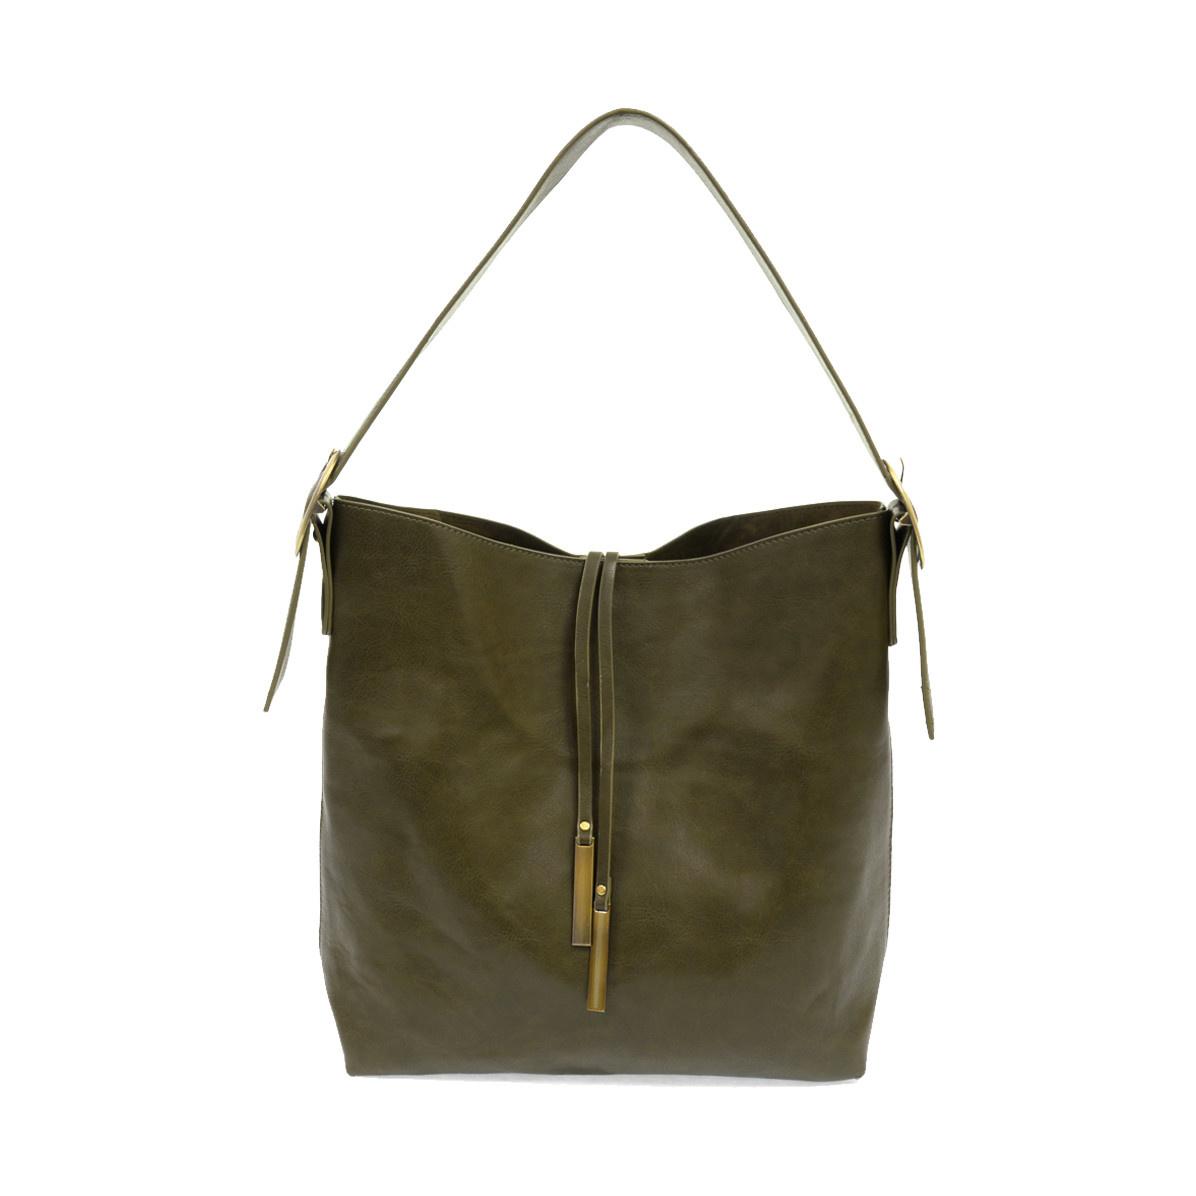 Joy Susan Joy Susan Jillian Hobo Handbag with Tassel Olive